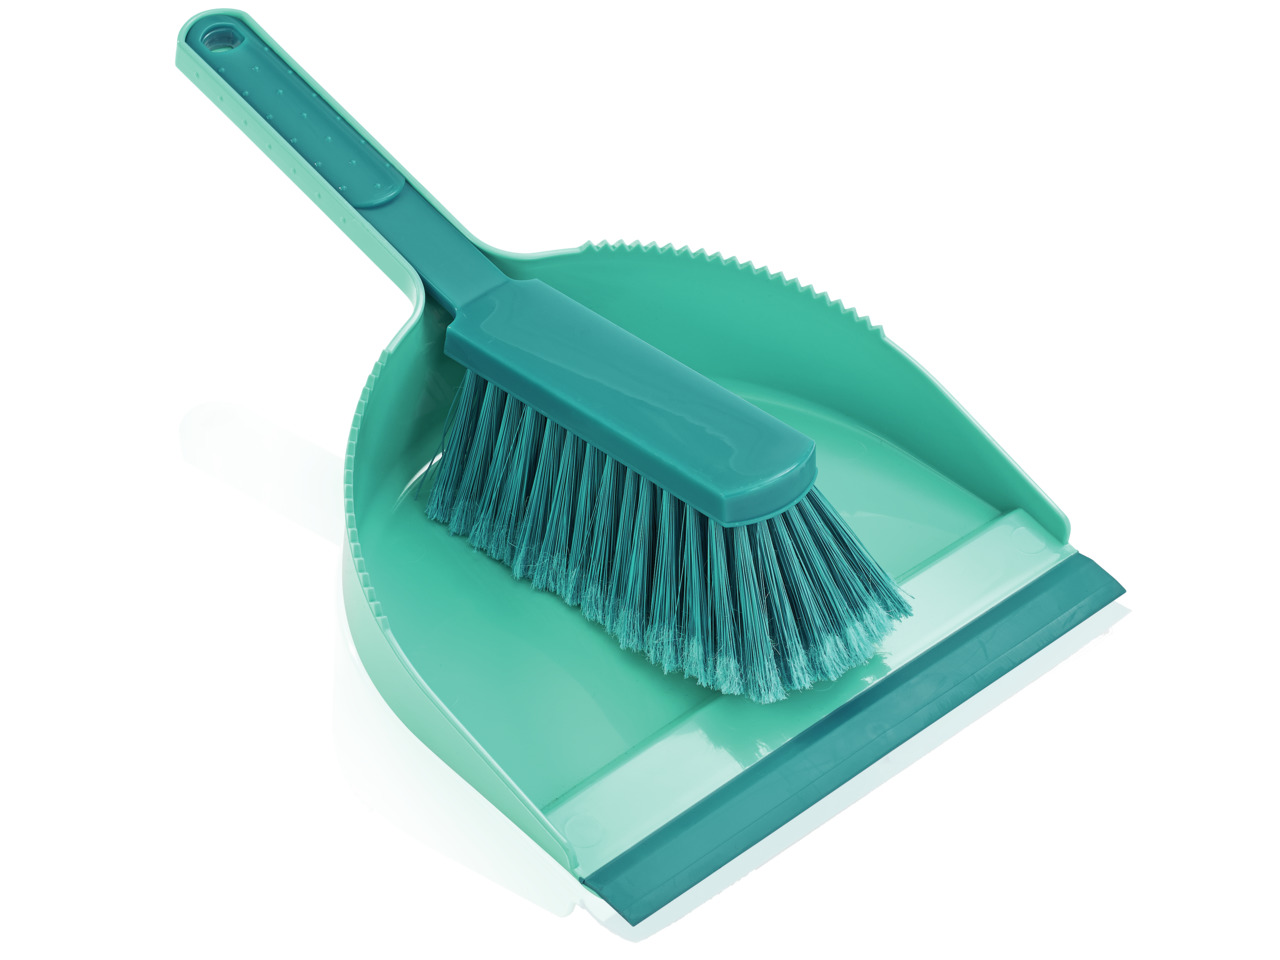 Brush clipart pan. Classic hand sweeper set